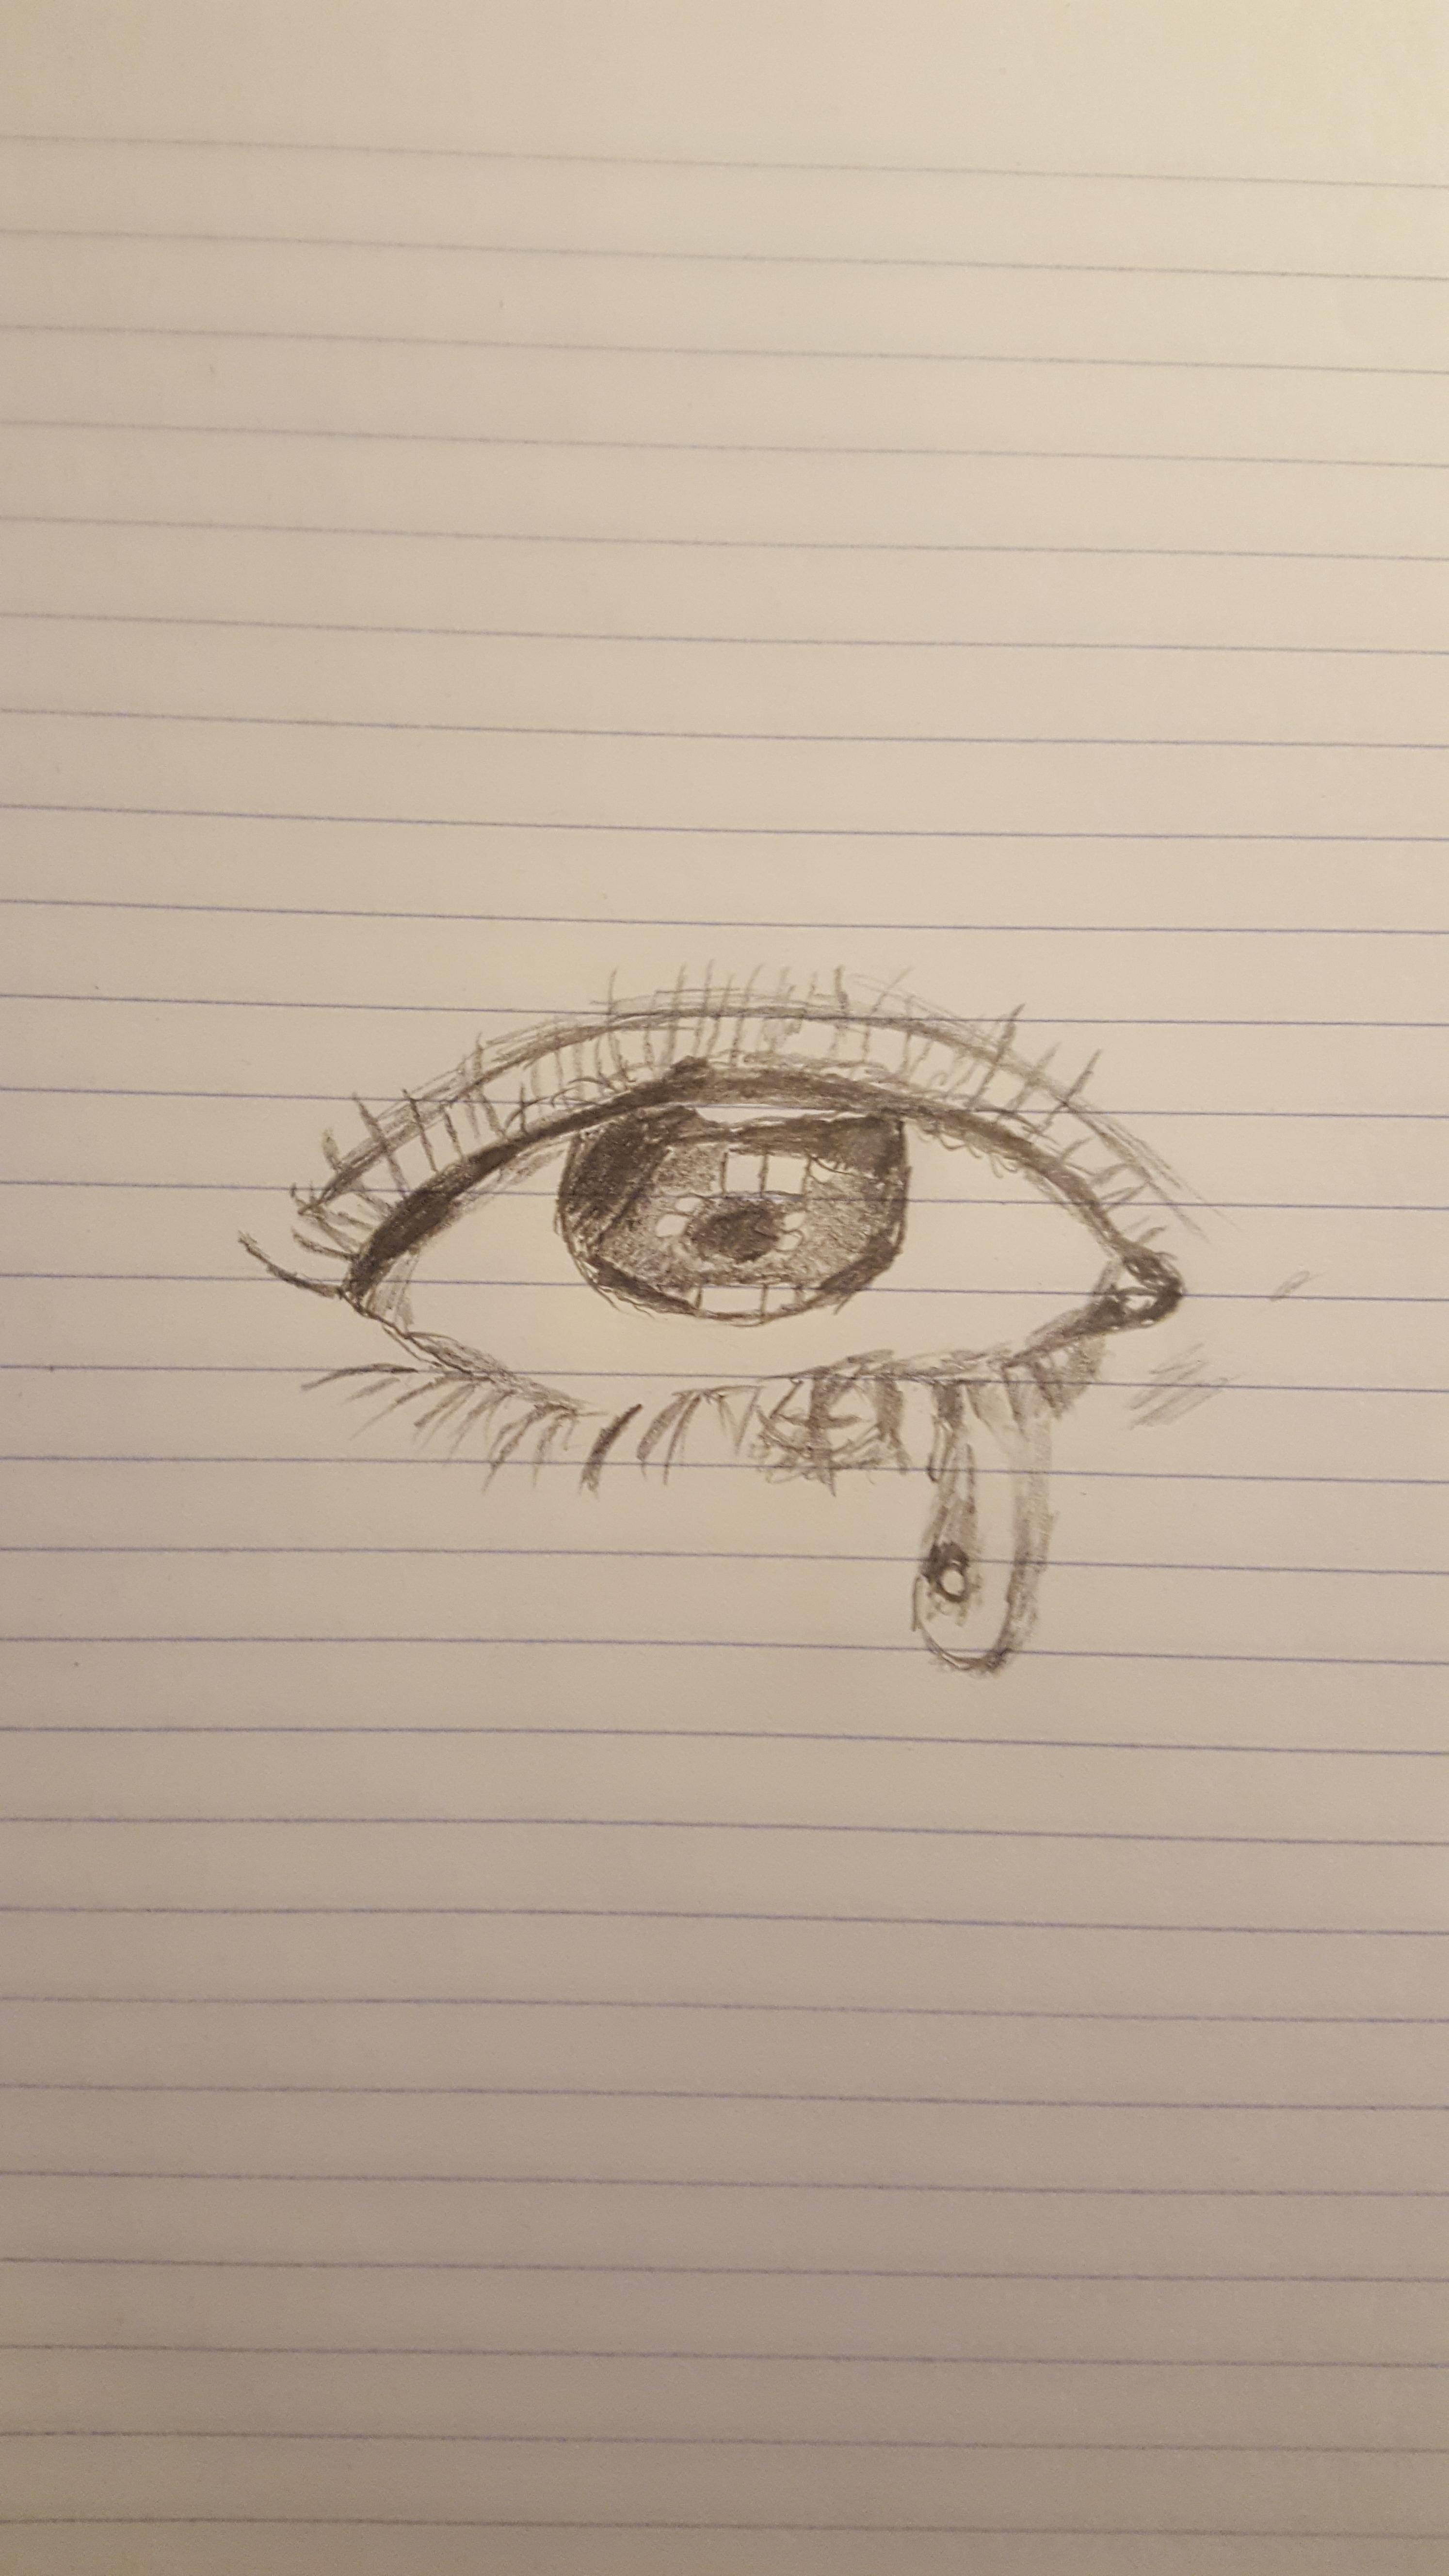 Human eye attempt